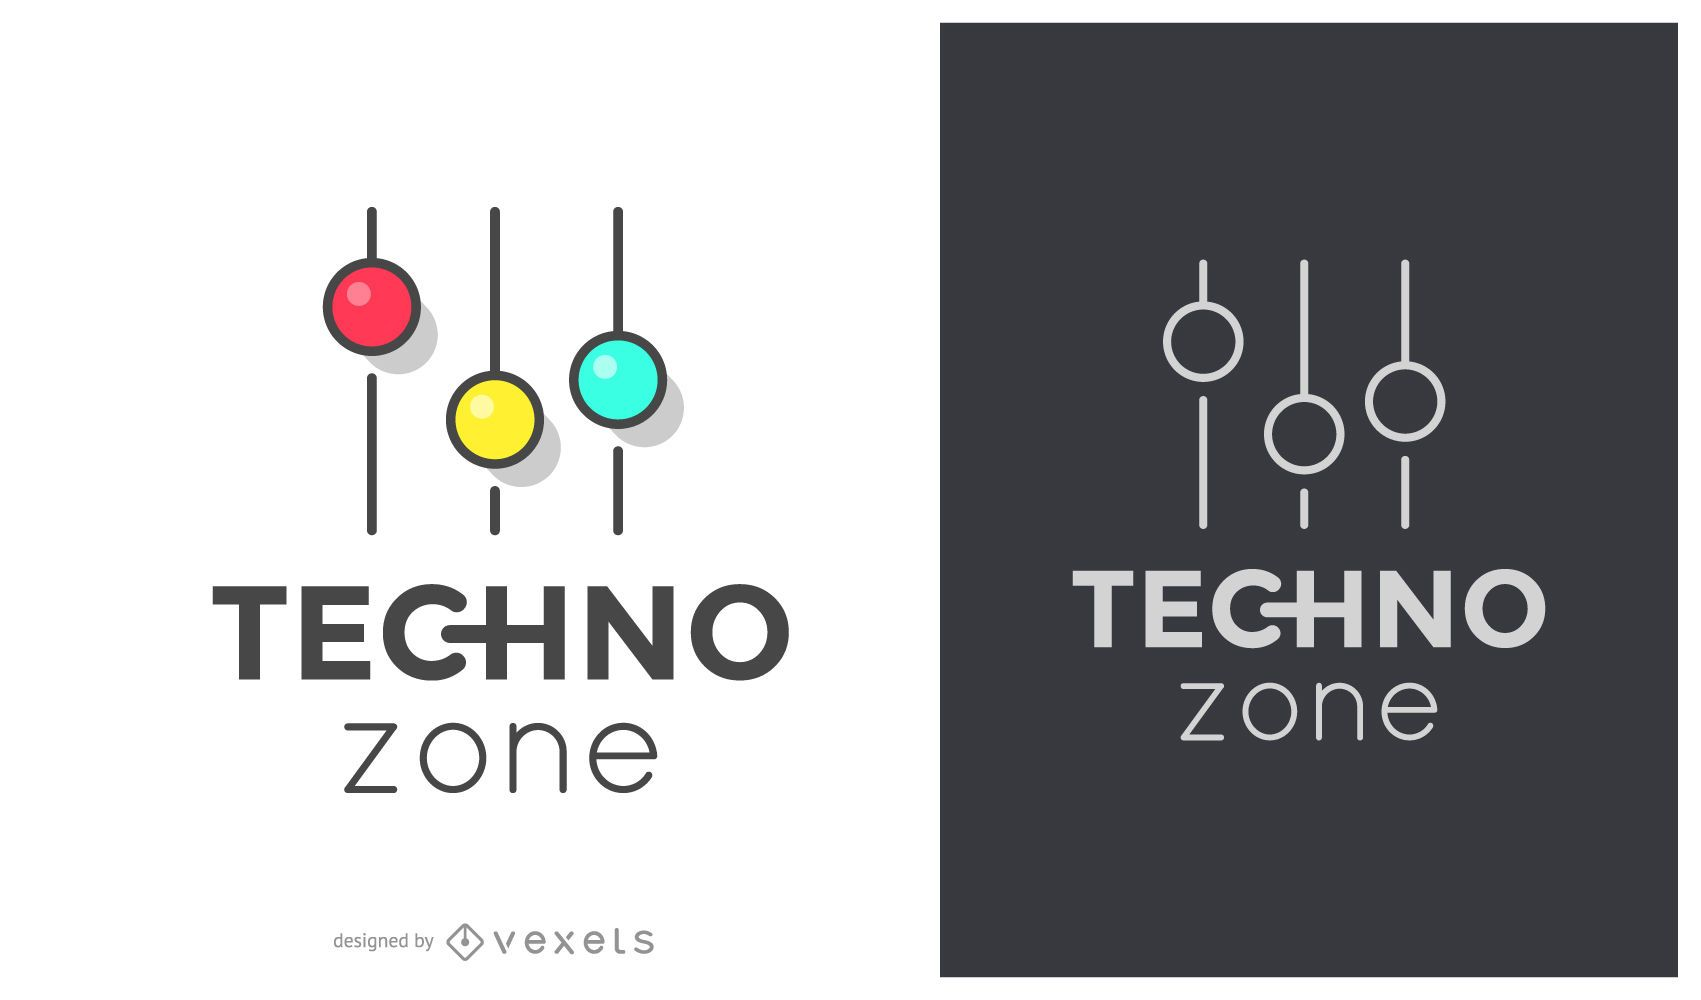 Techno zone music logo